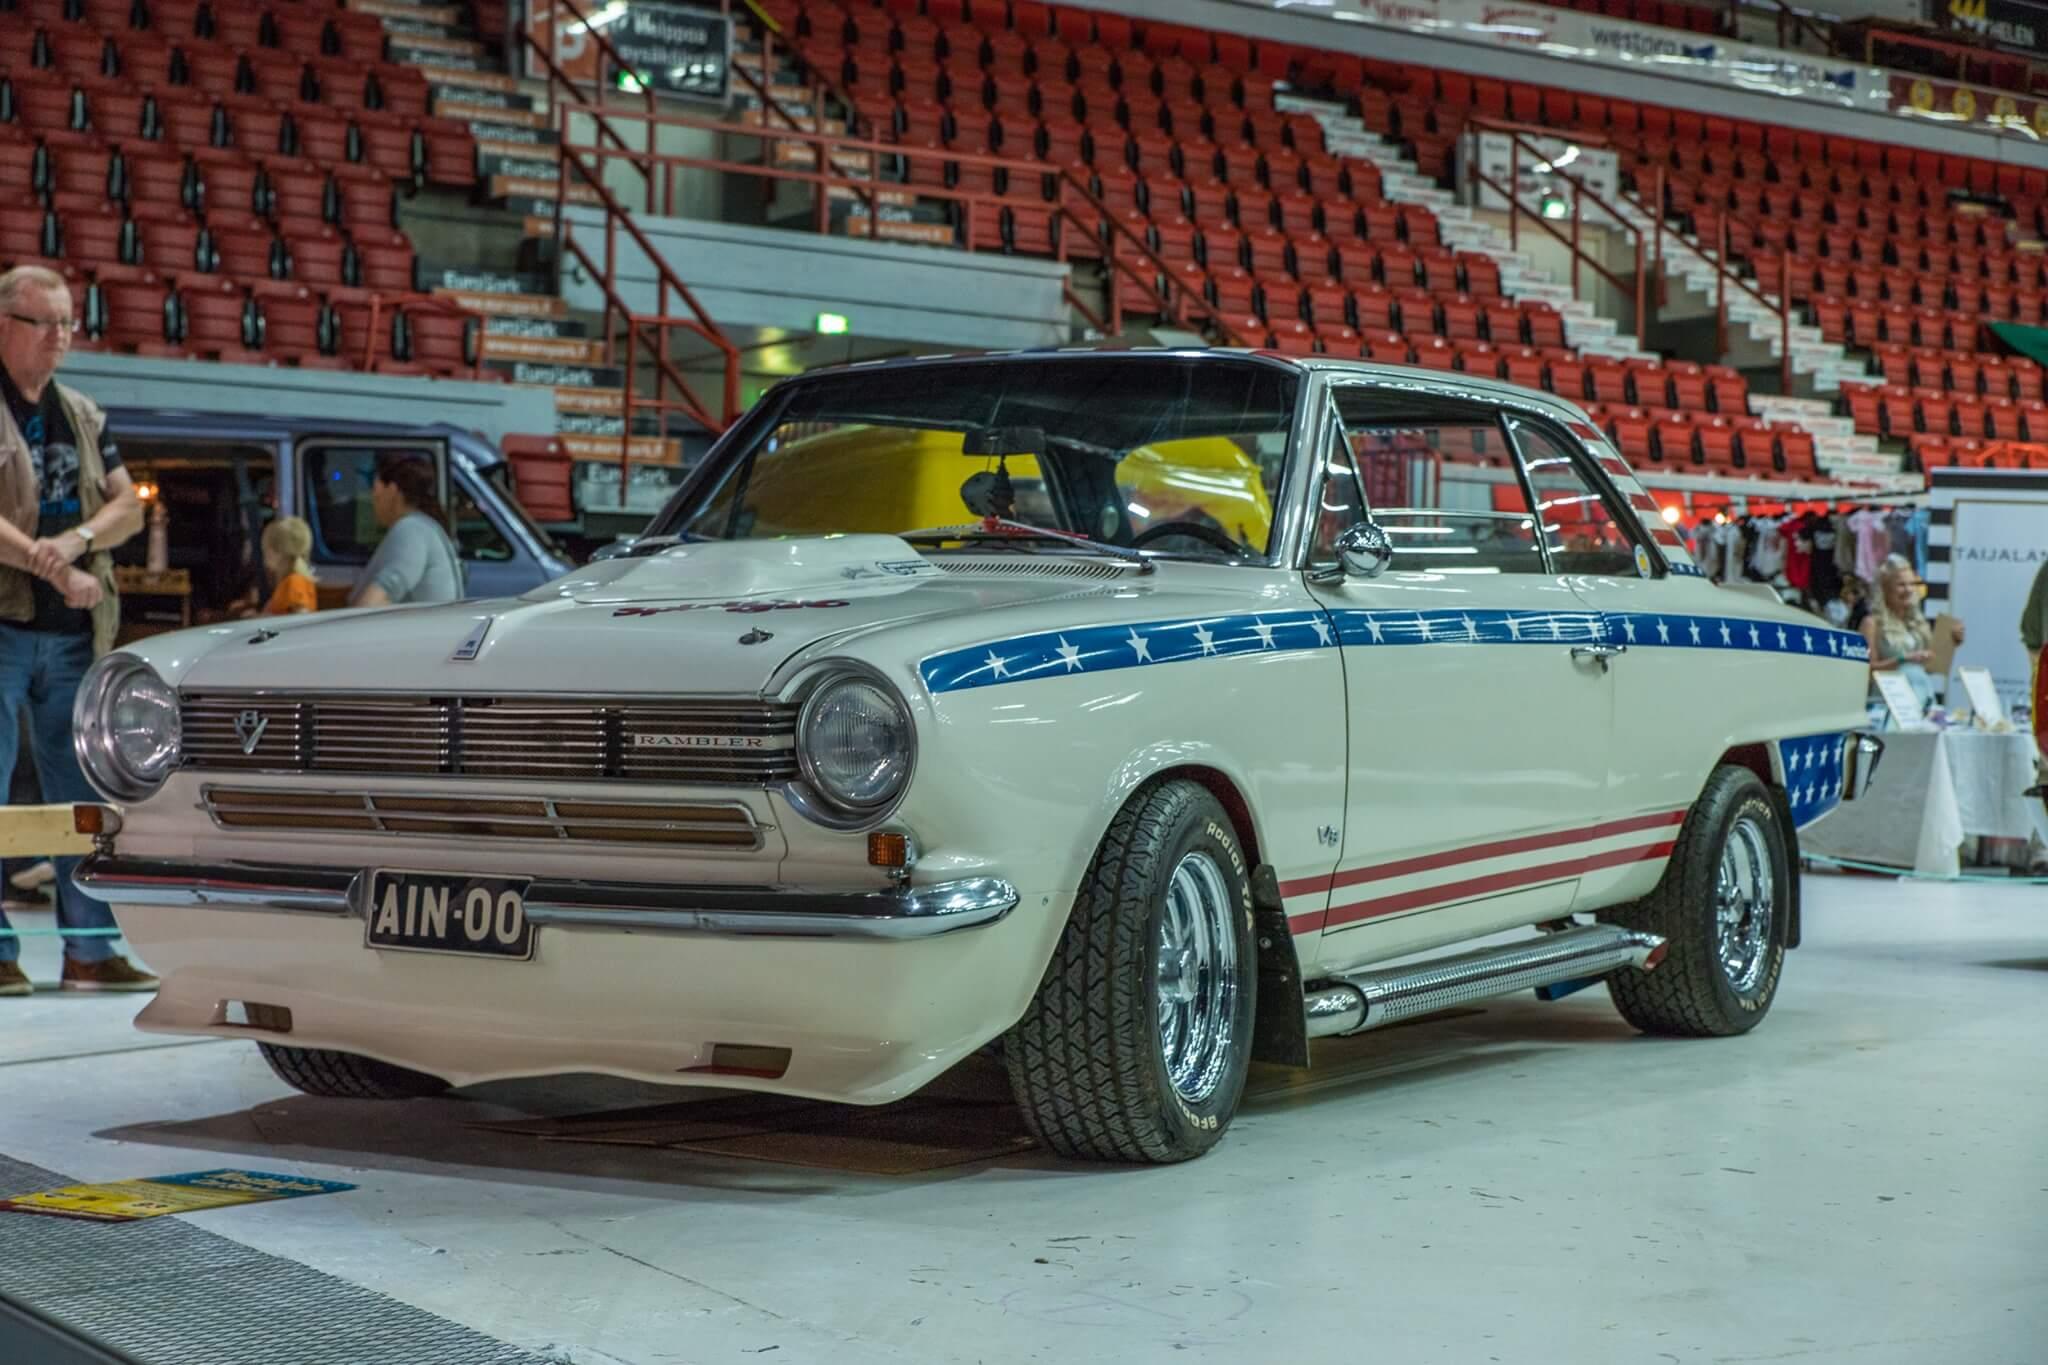 Nostalgia Car Show mainoskuva